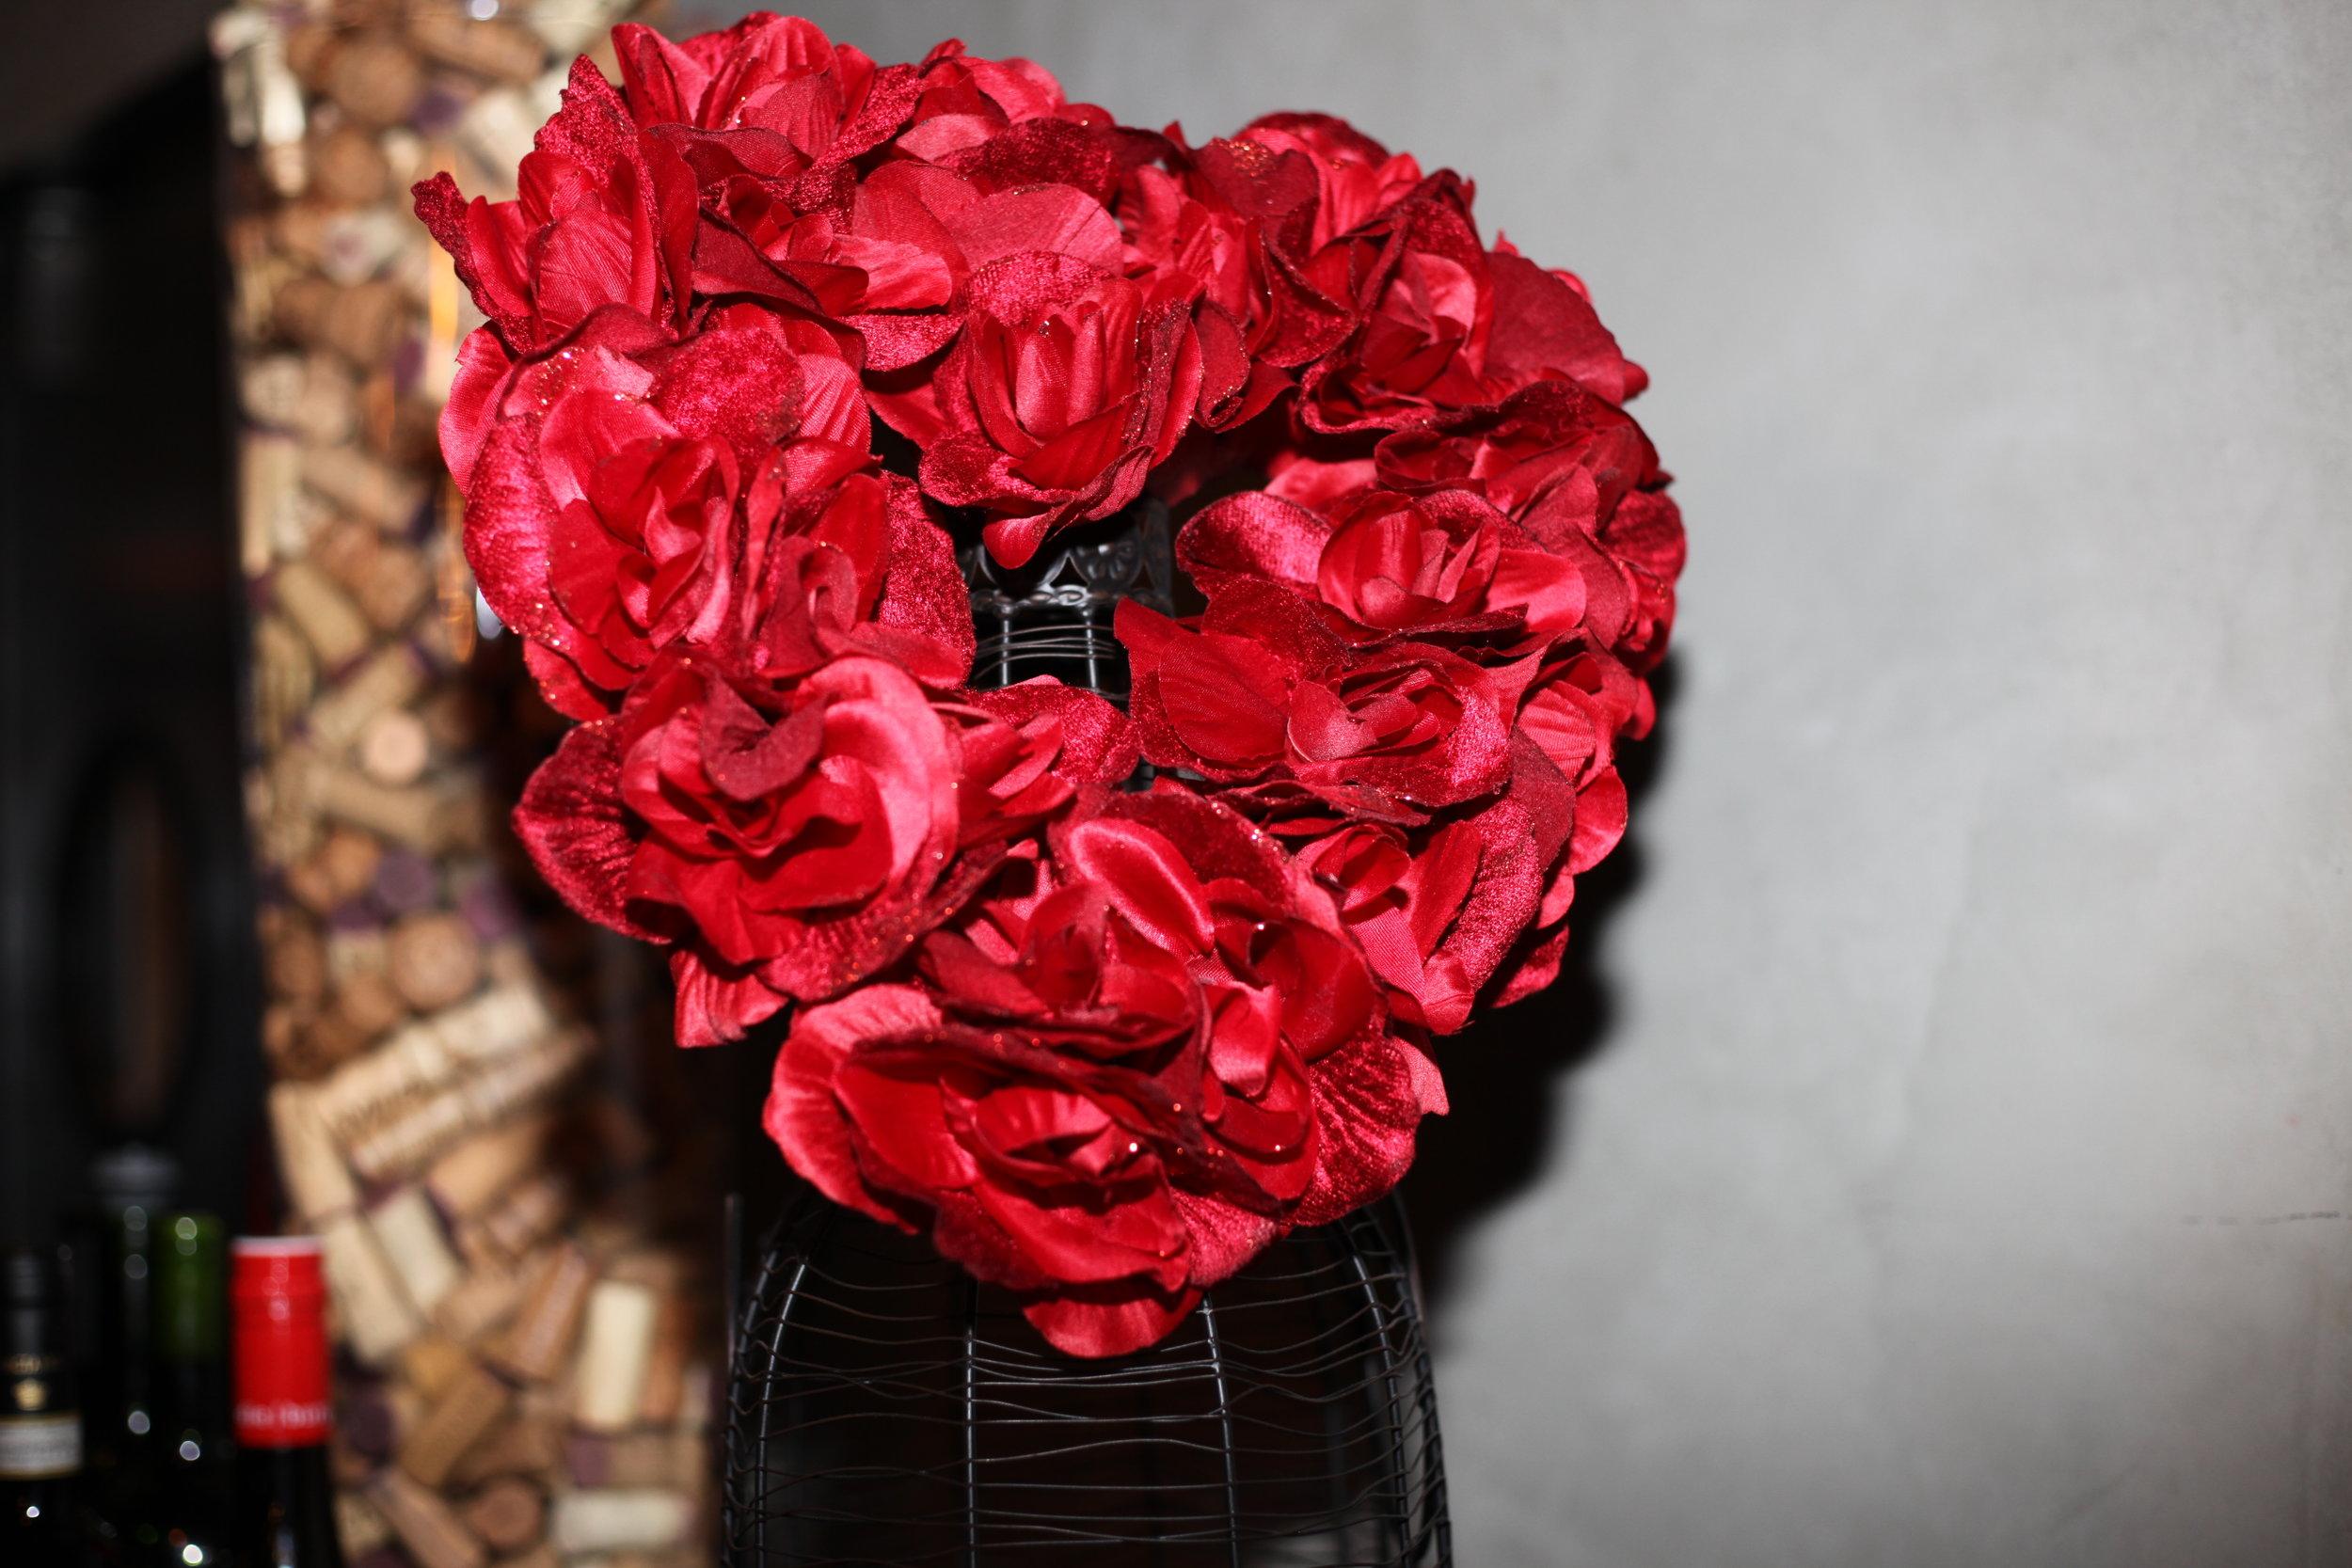 Heart_Bouquet_Wine_Tasting_Dvine.jpg